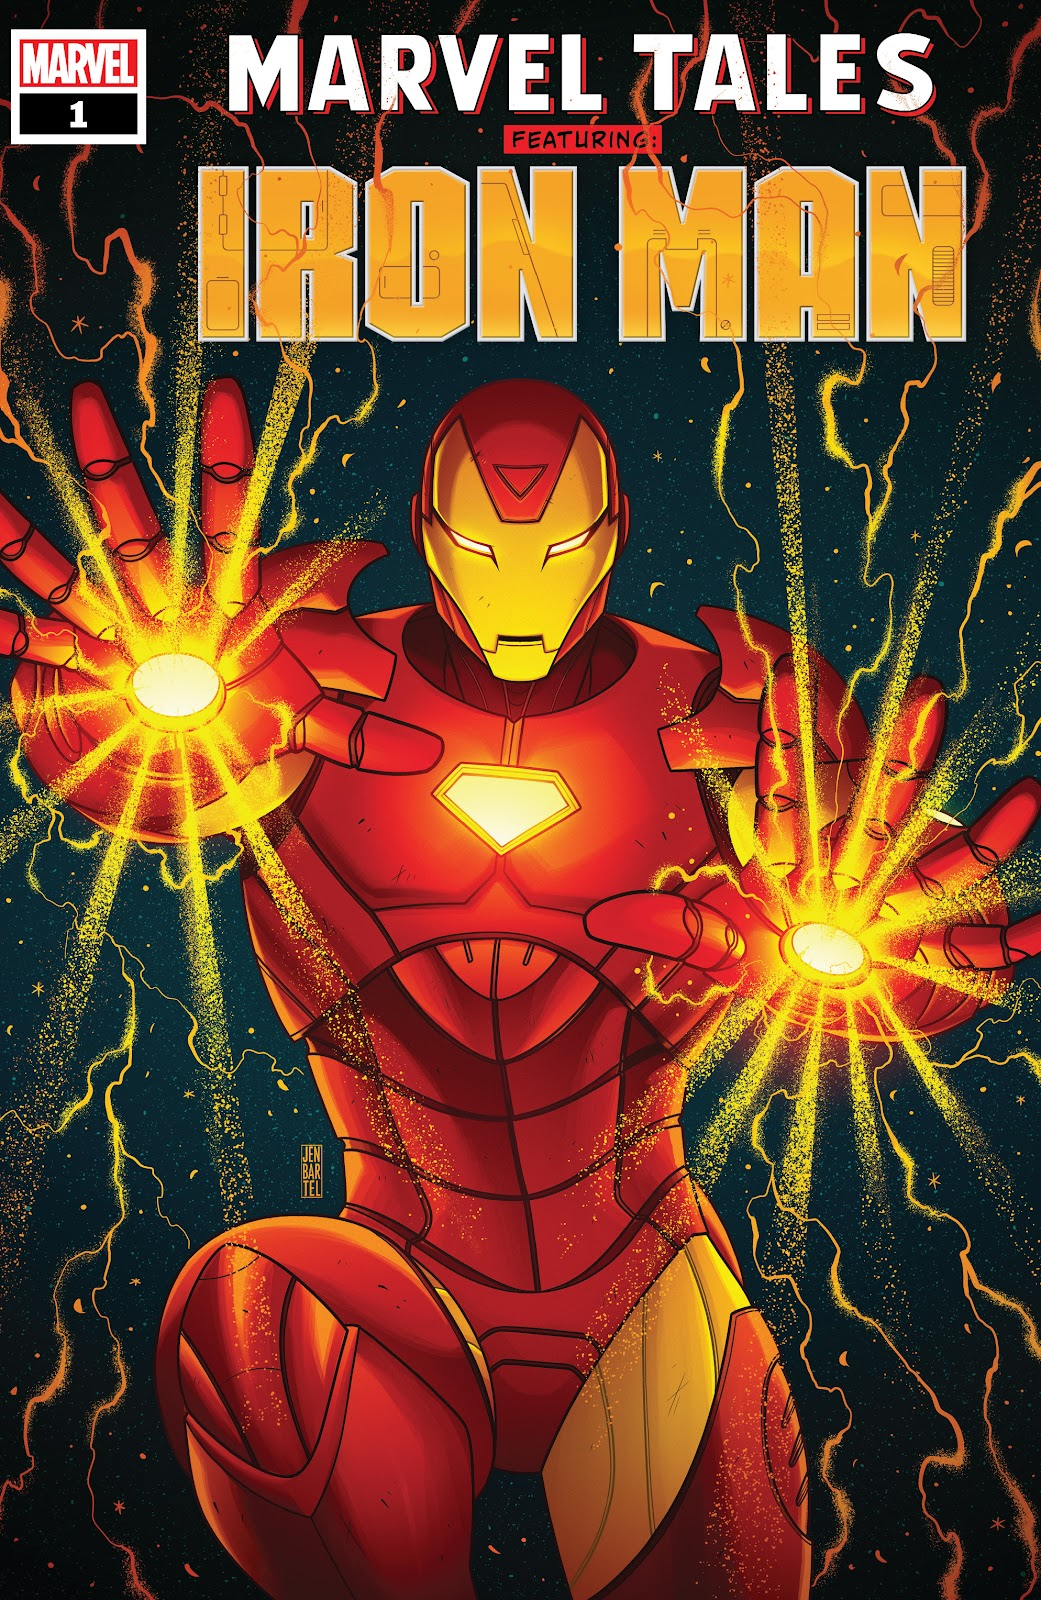 Read online Marvel Tales: Iron Man comic -  Issue # Full - 1